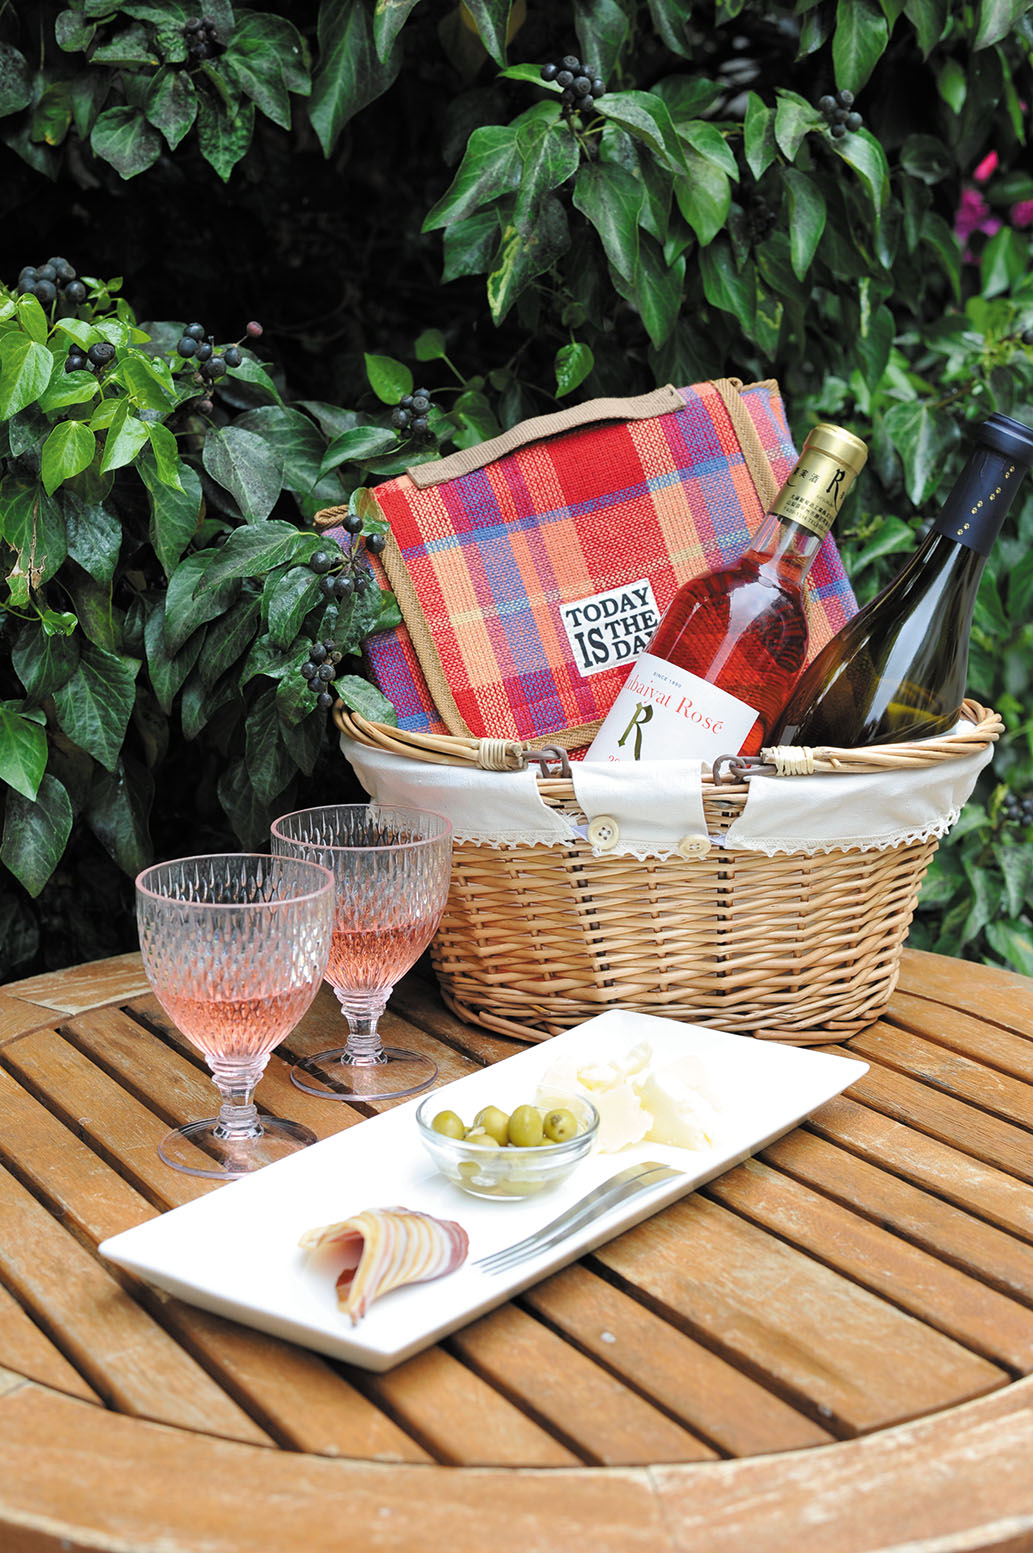 「PICNICセット」ワイン、おつまみ3種などが入ったバスケットをもって近くの森へピクニック。